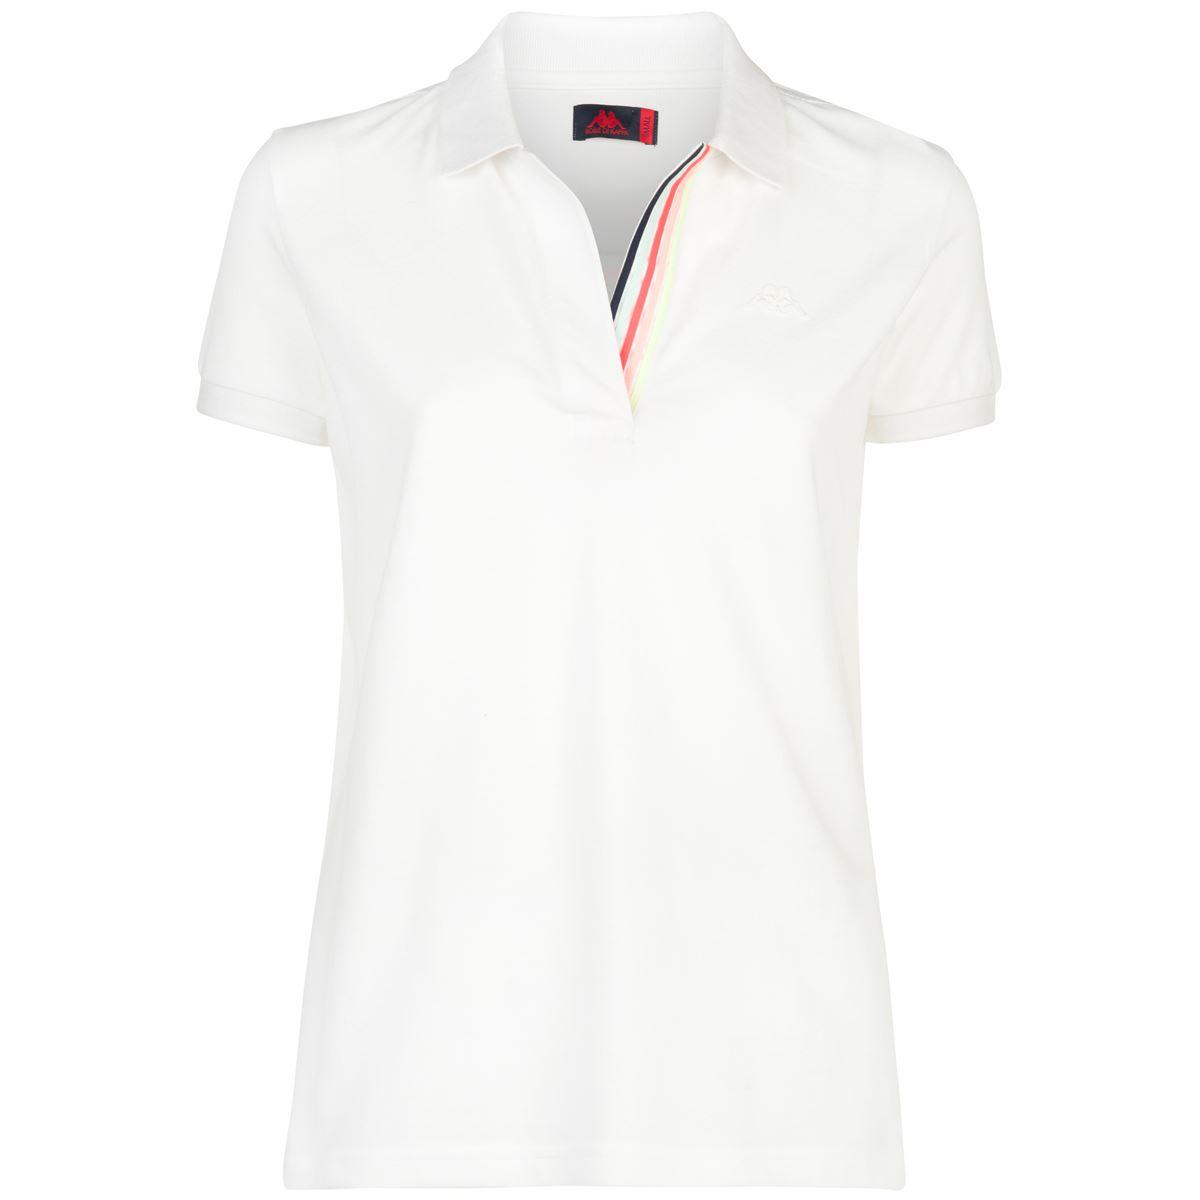 Robe di Kappa Polo Shirts donna-61136GW